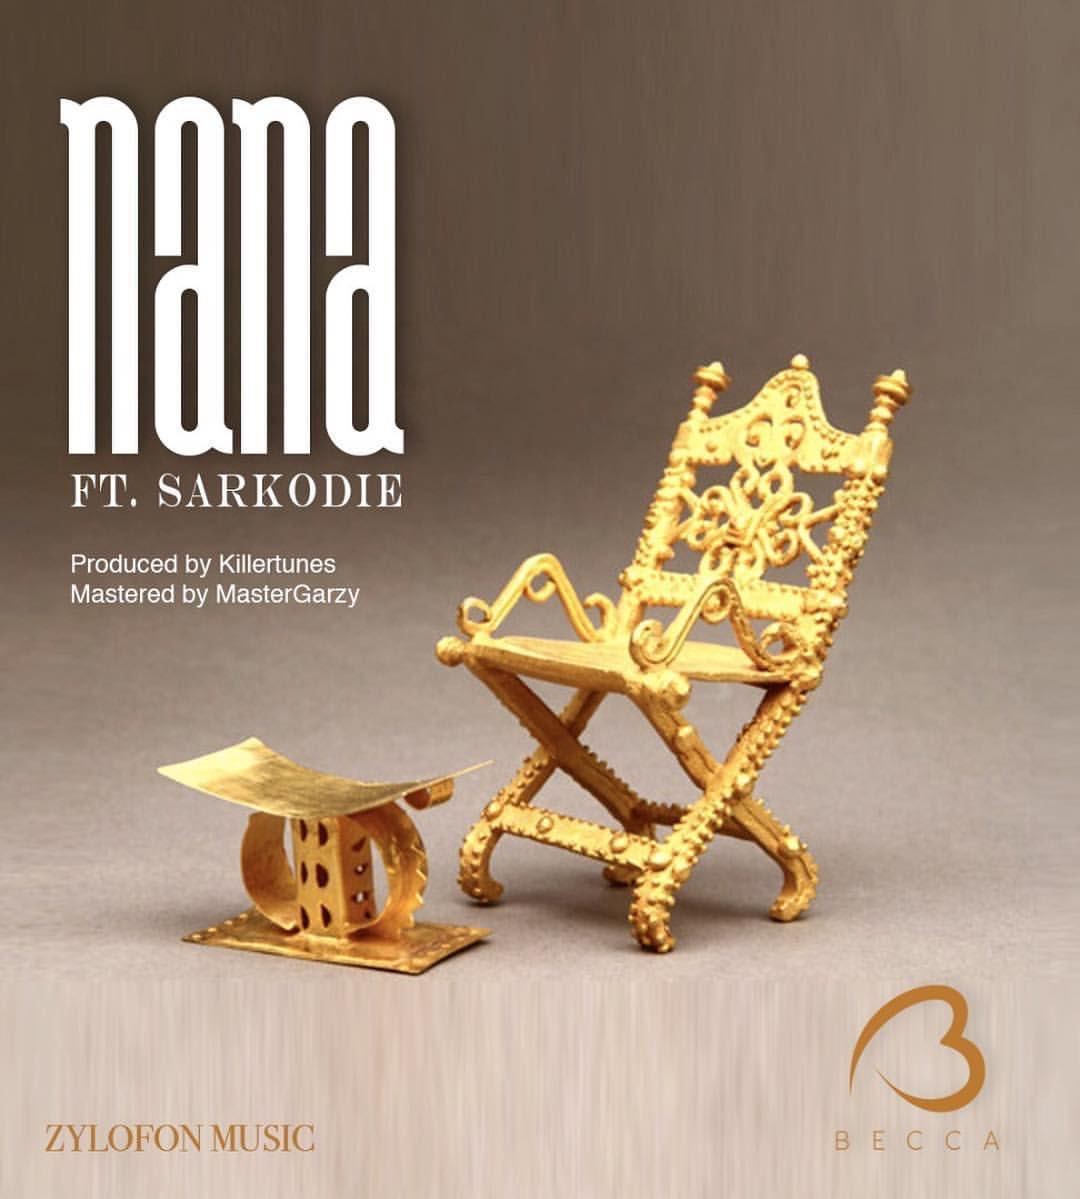 Becca ft. Sarkodie – Nana